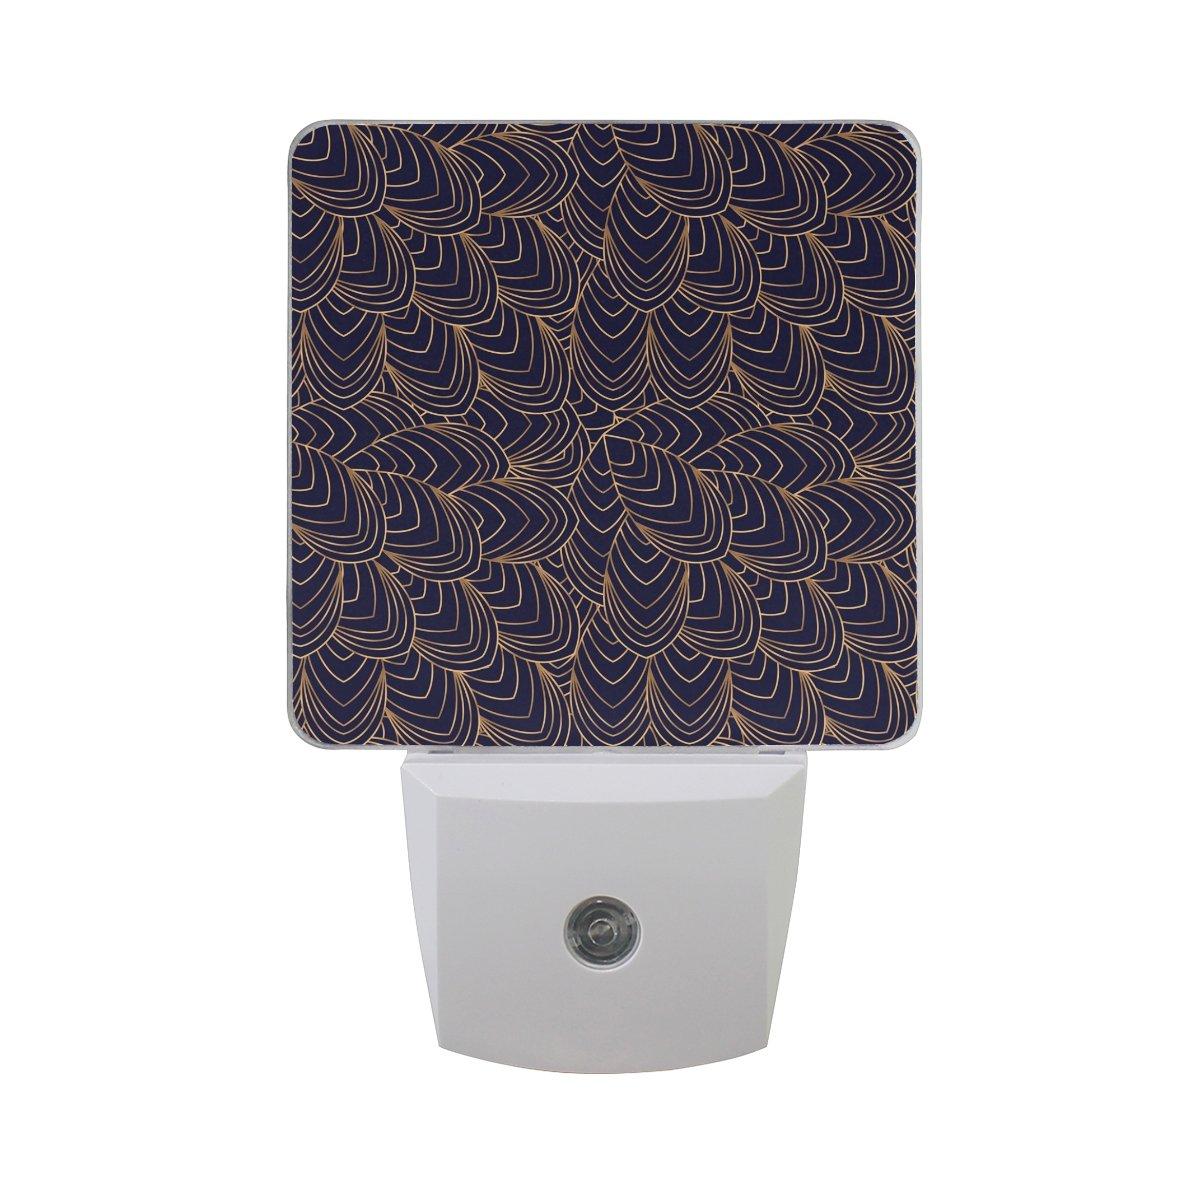 Plug-in Night Light LED Lamp Luxury Background Peacock Printing with Dusk to Dawn Sensor for Bedroom, Bathroom, Hallway, Stairways, 2 Pack-0.5W